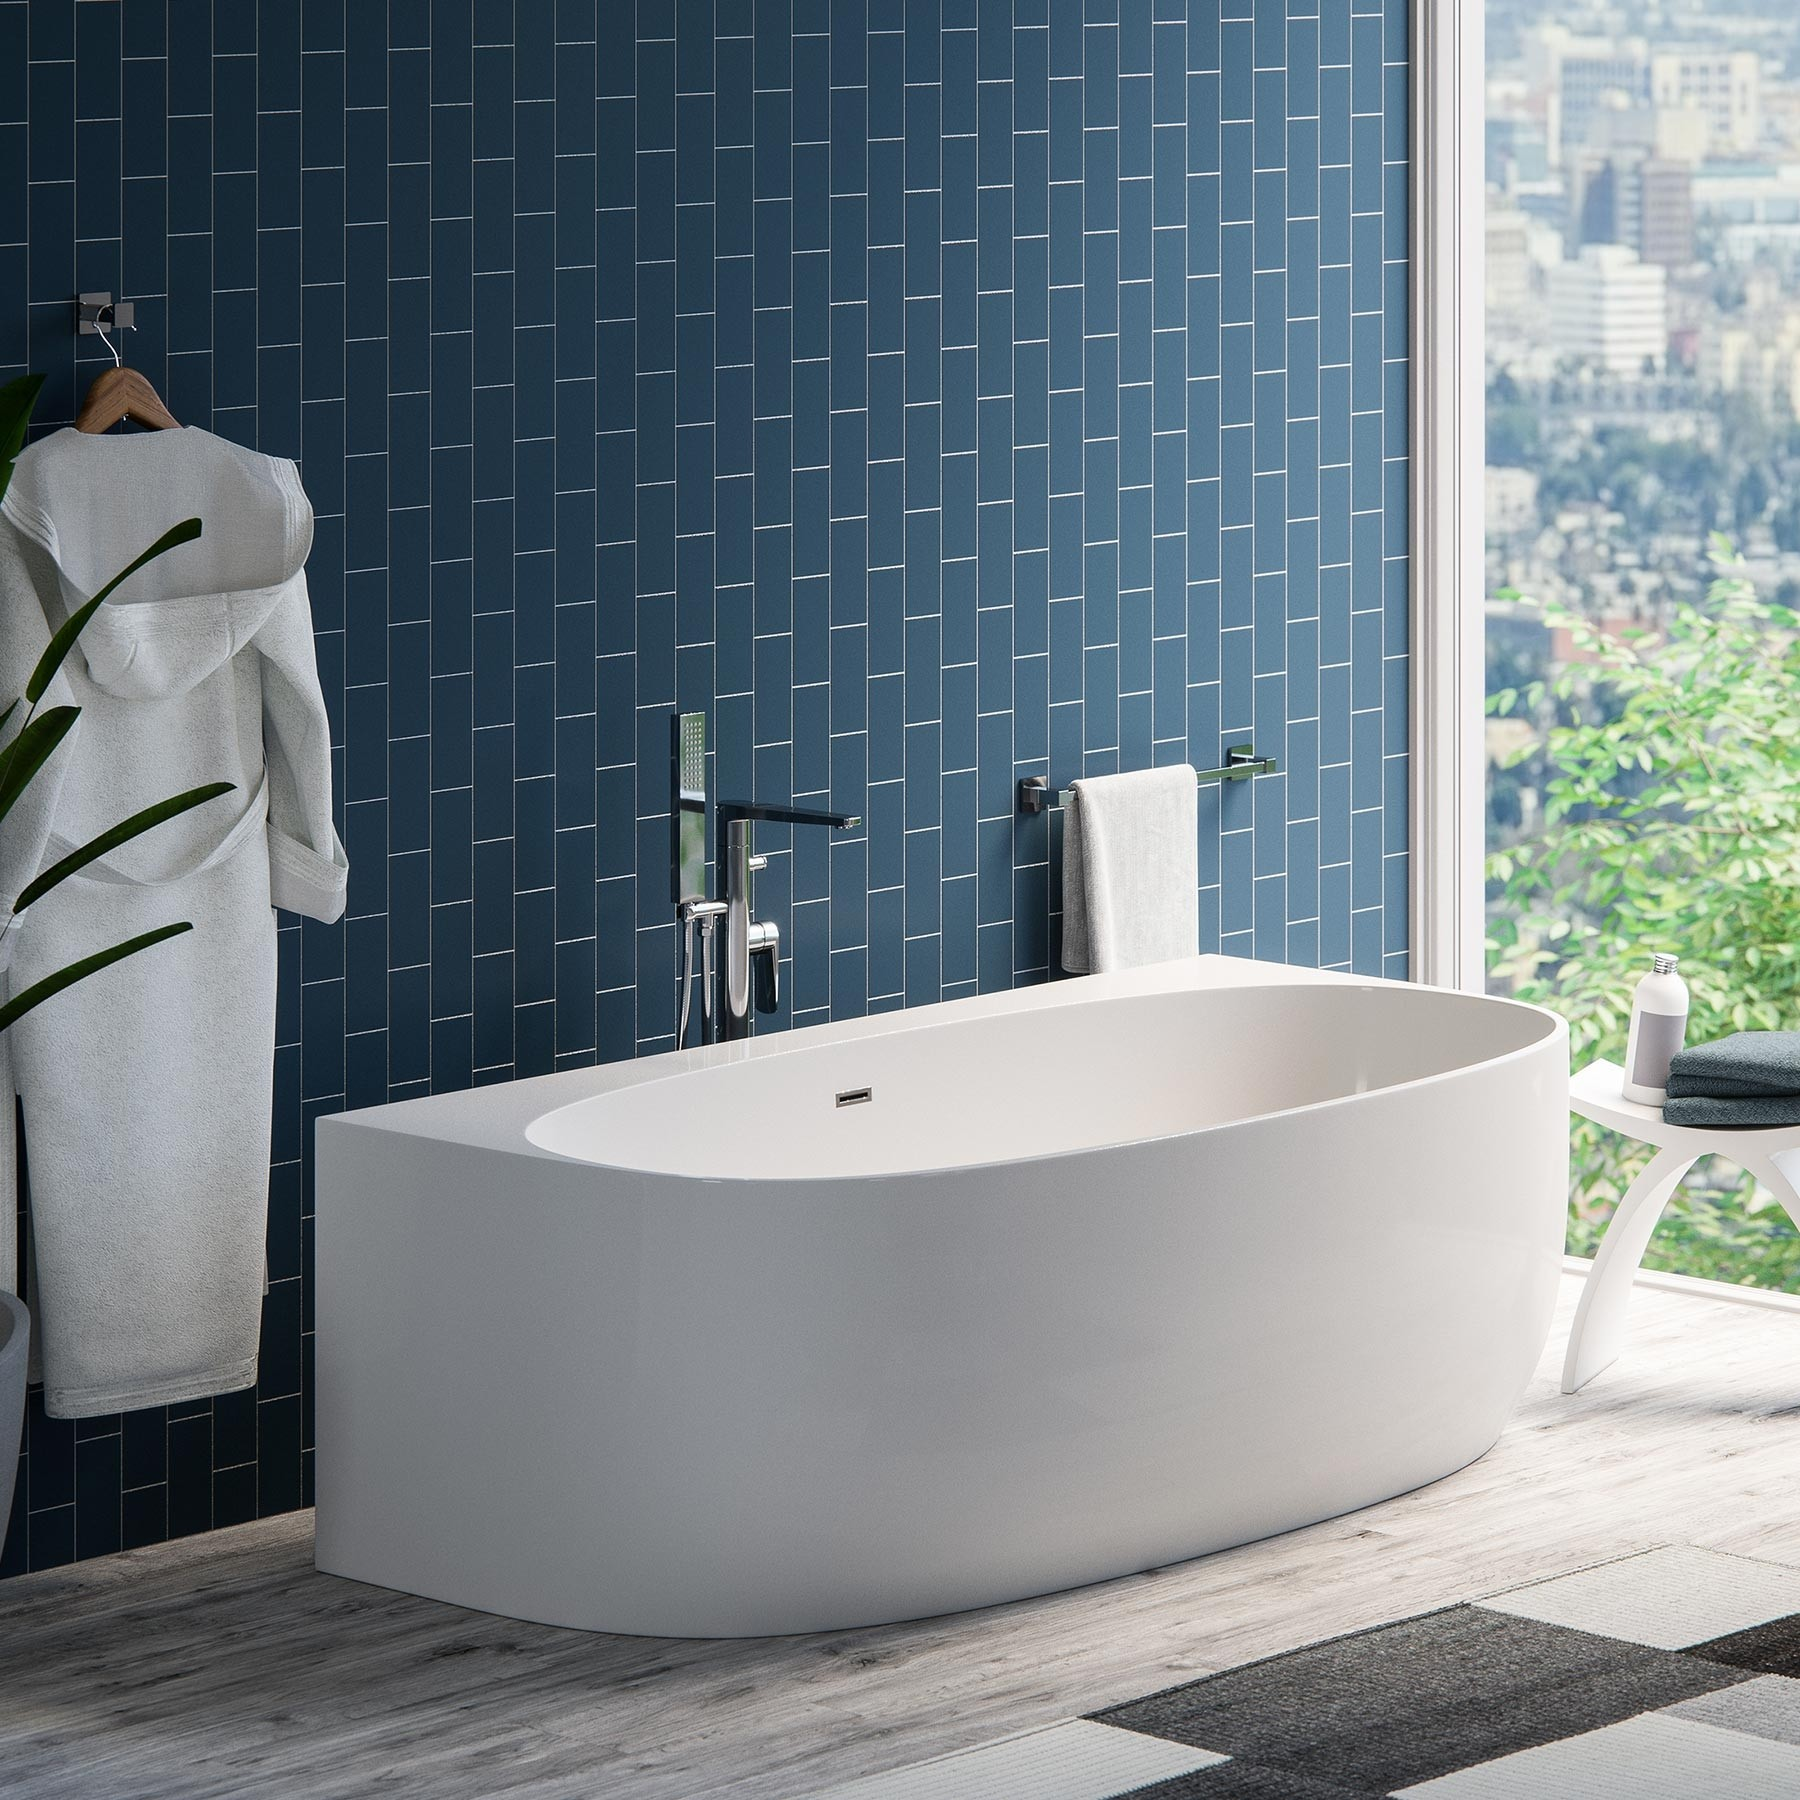 Magnificent Alcove Bathtub Image - Bathtub Ideas - dilata.info